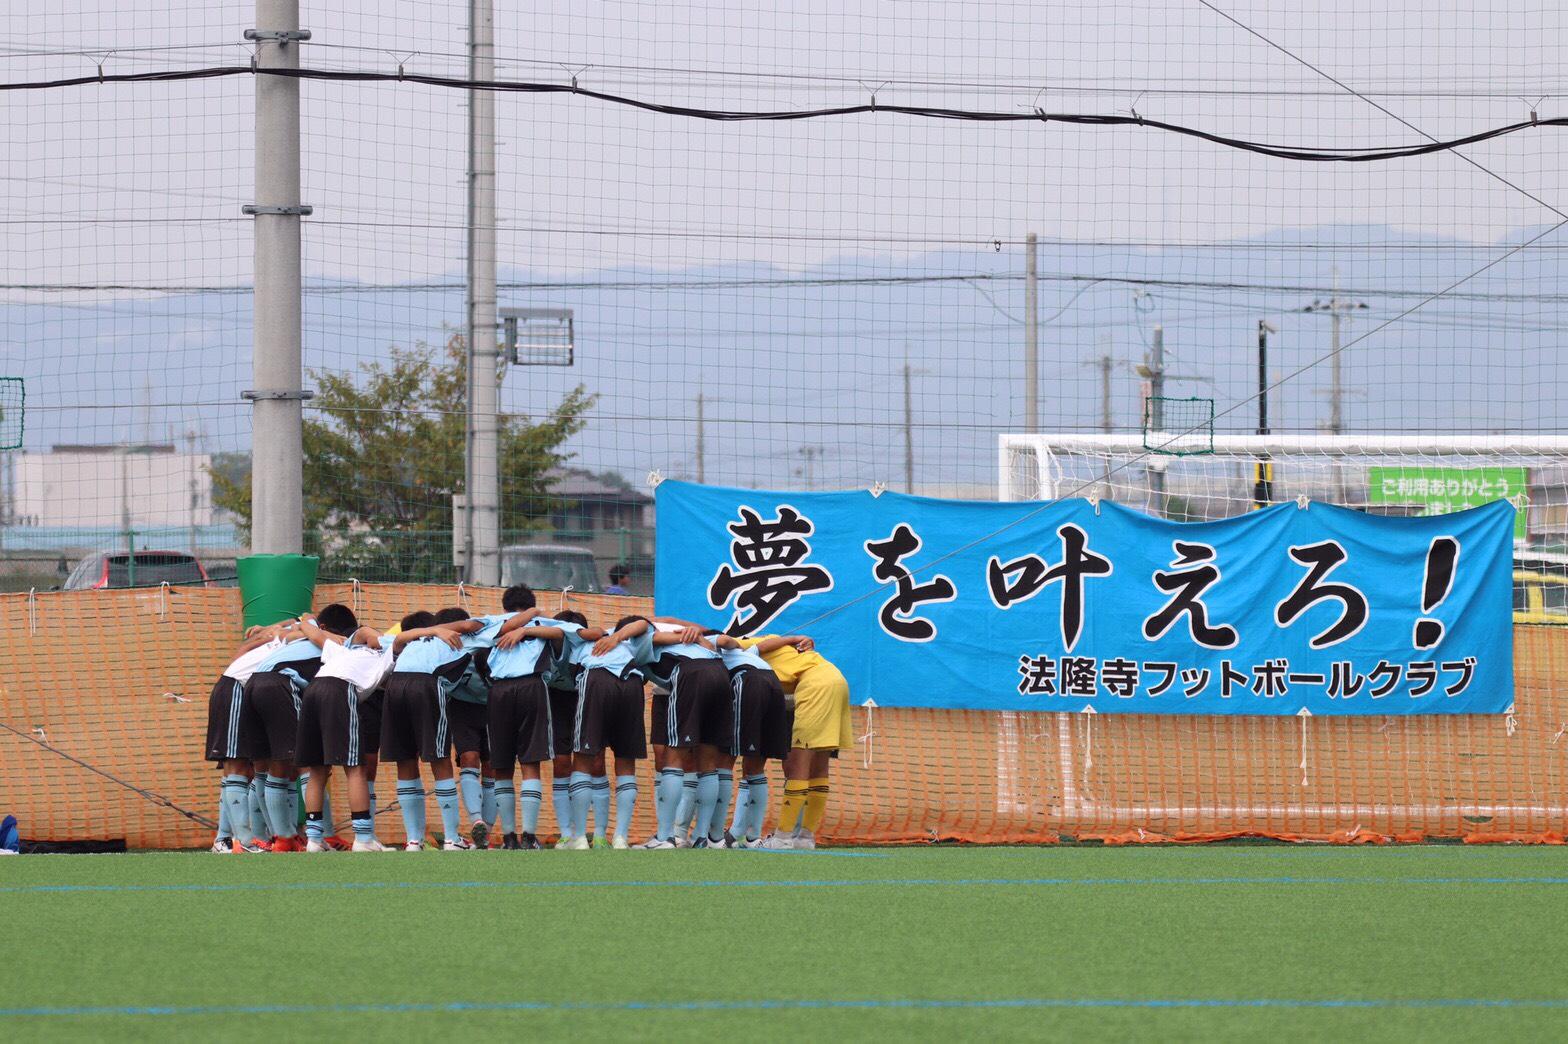 NFAスーパーカップ 【高円宮杯プレーオフ、チャレンジ】 《御礼》